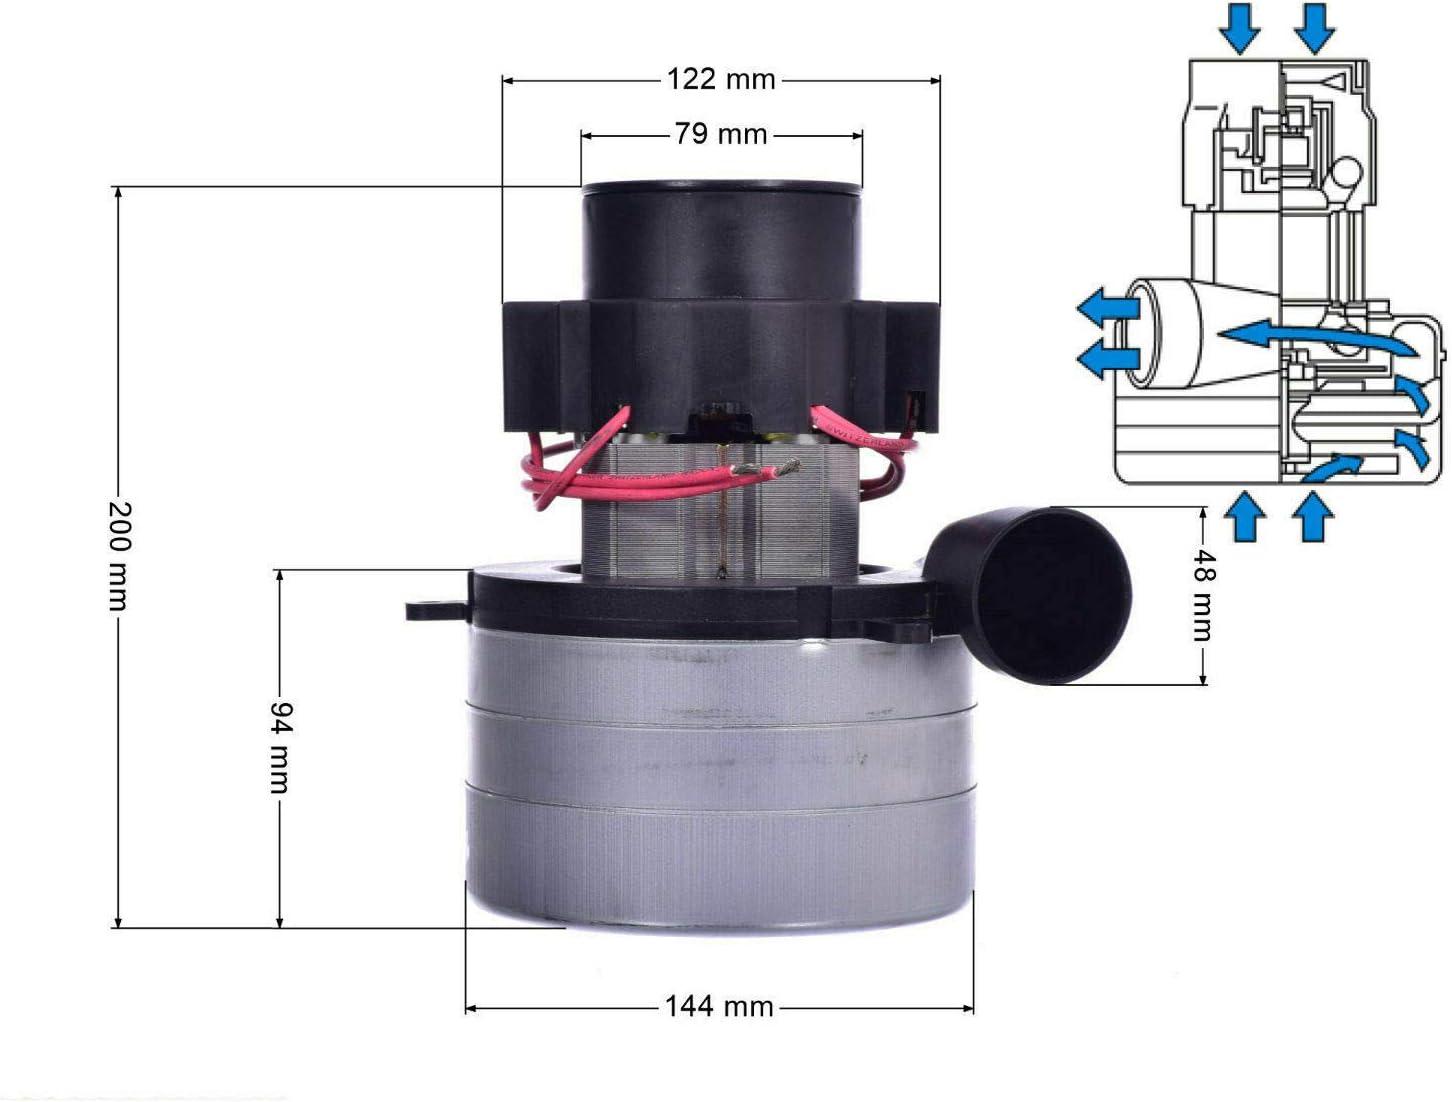 36 V 600 W Motor de succi/ón para m/áquina de aspiraci/ón Comac Fimap Nightish RCM Tennant CTM